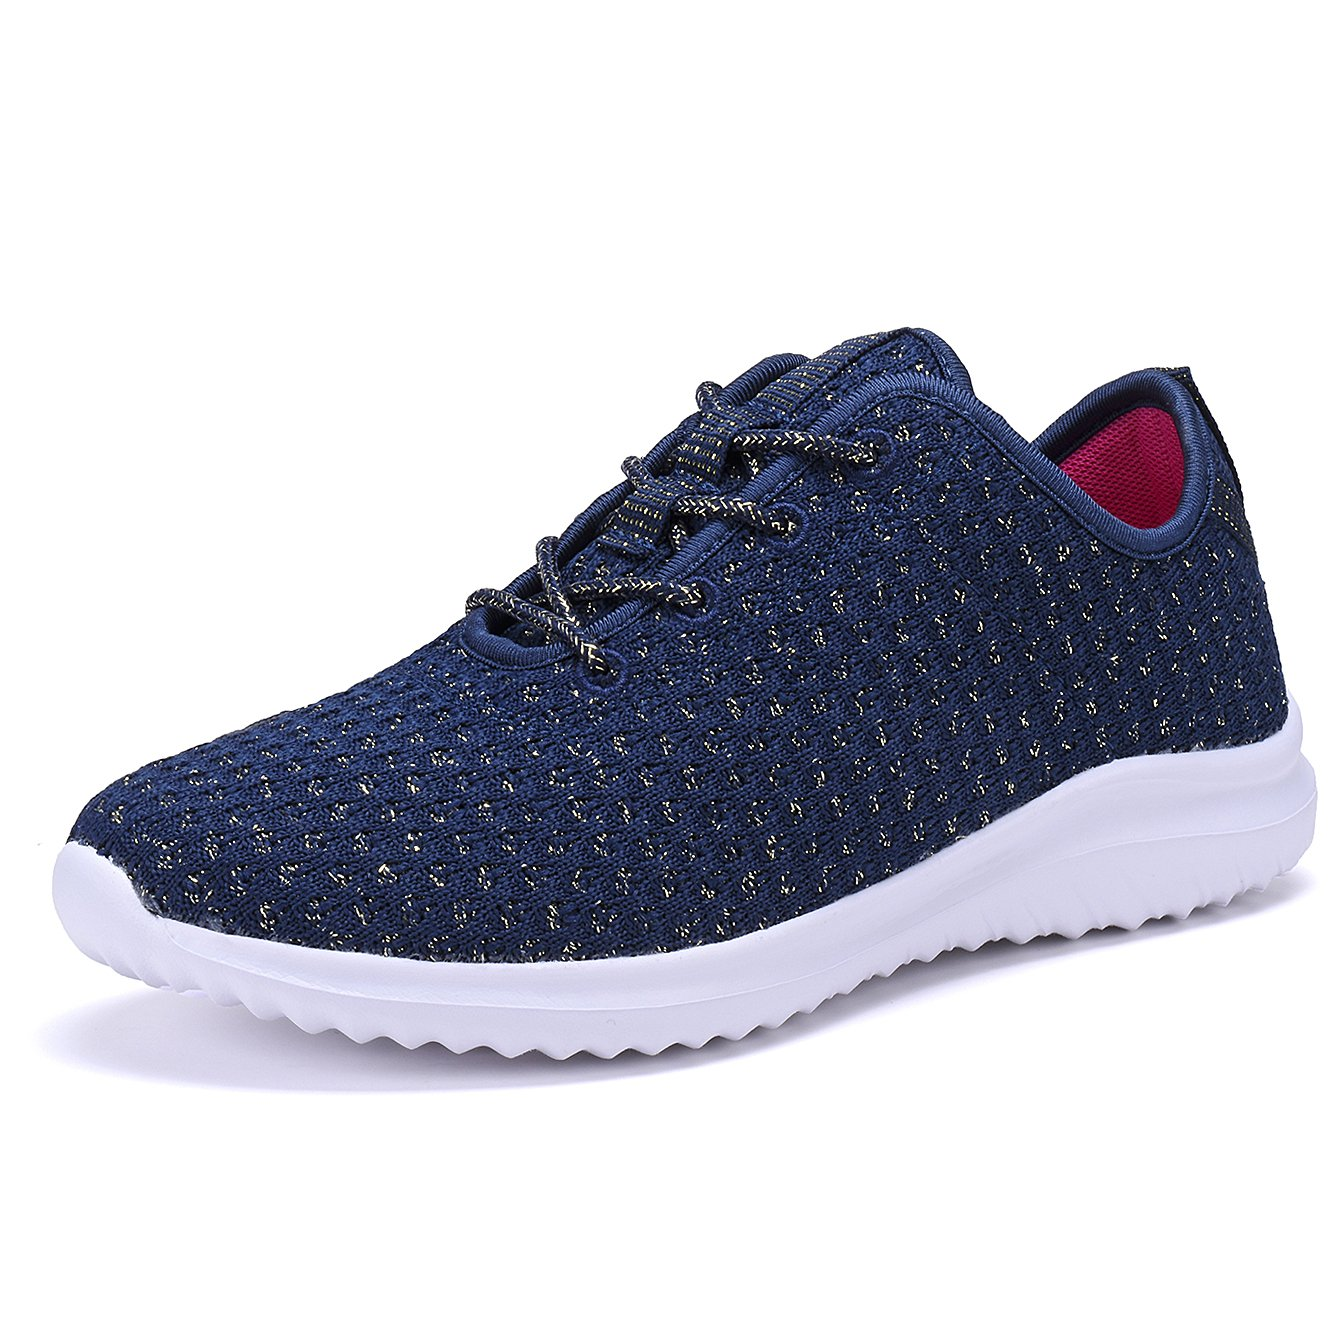 a4b9ad78c25 YILAN Women s Fashion Sneakers Breathable Sport Shoes  Amazon.ca  Shoes    Handbags